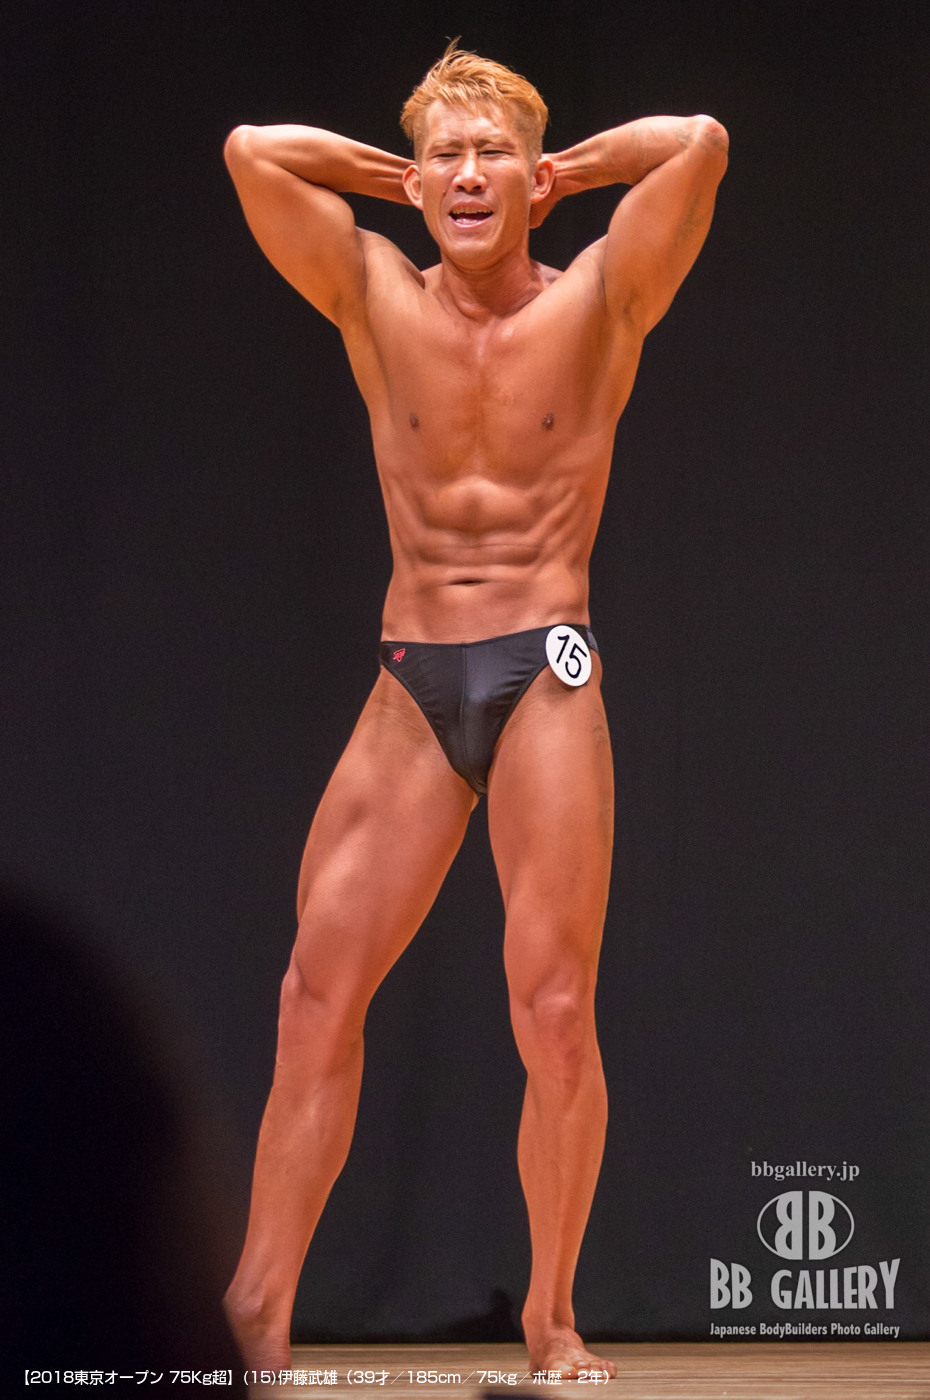 【2018東京オープン 75Kg超】(15)伊藤武雄(39才/185cm/75kg/ボ歴:2年)